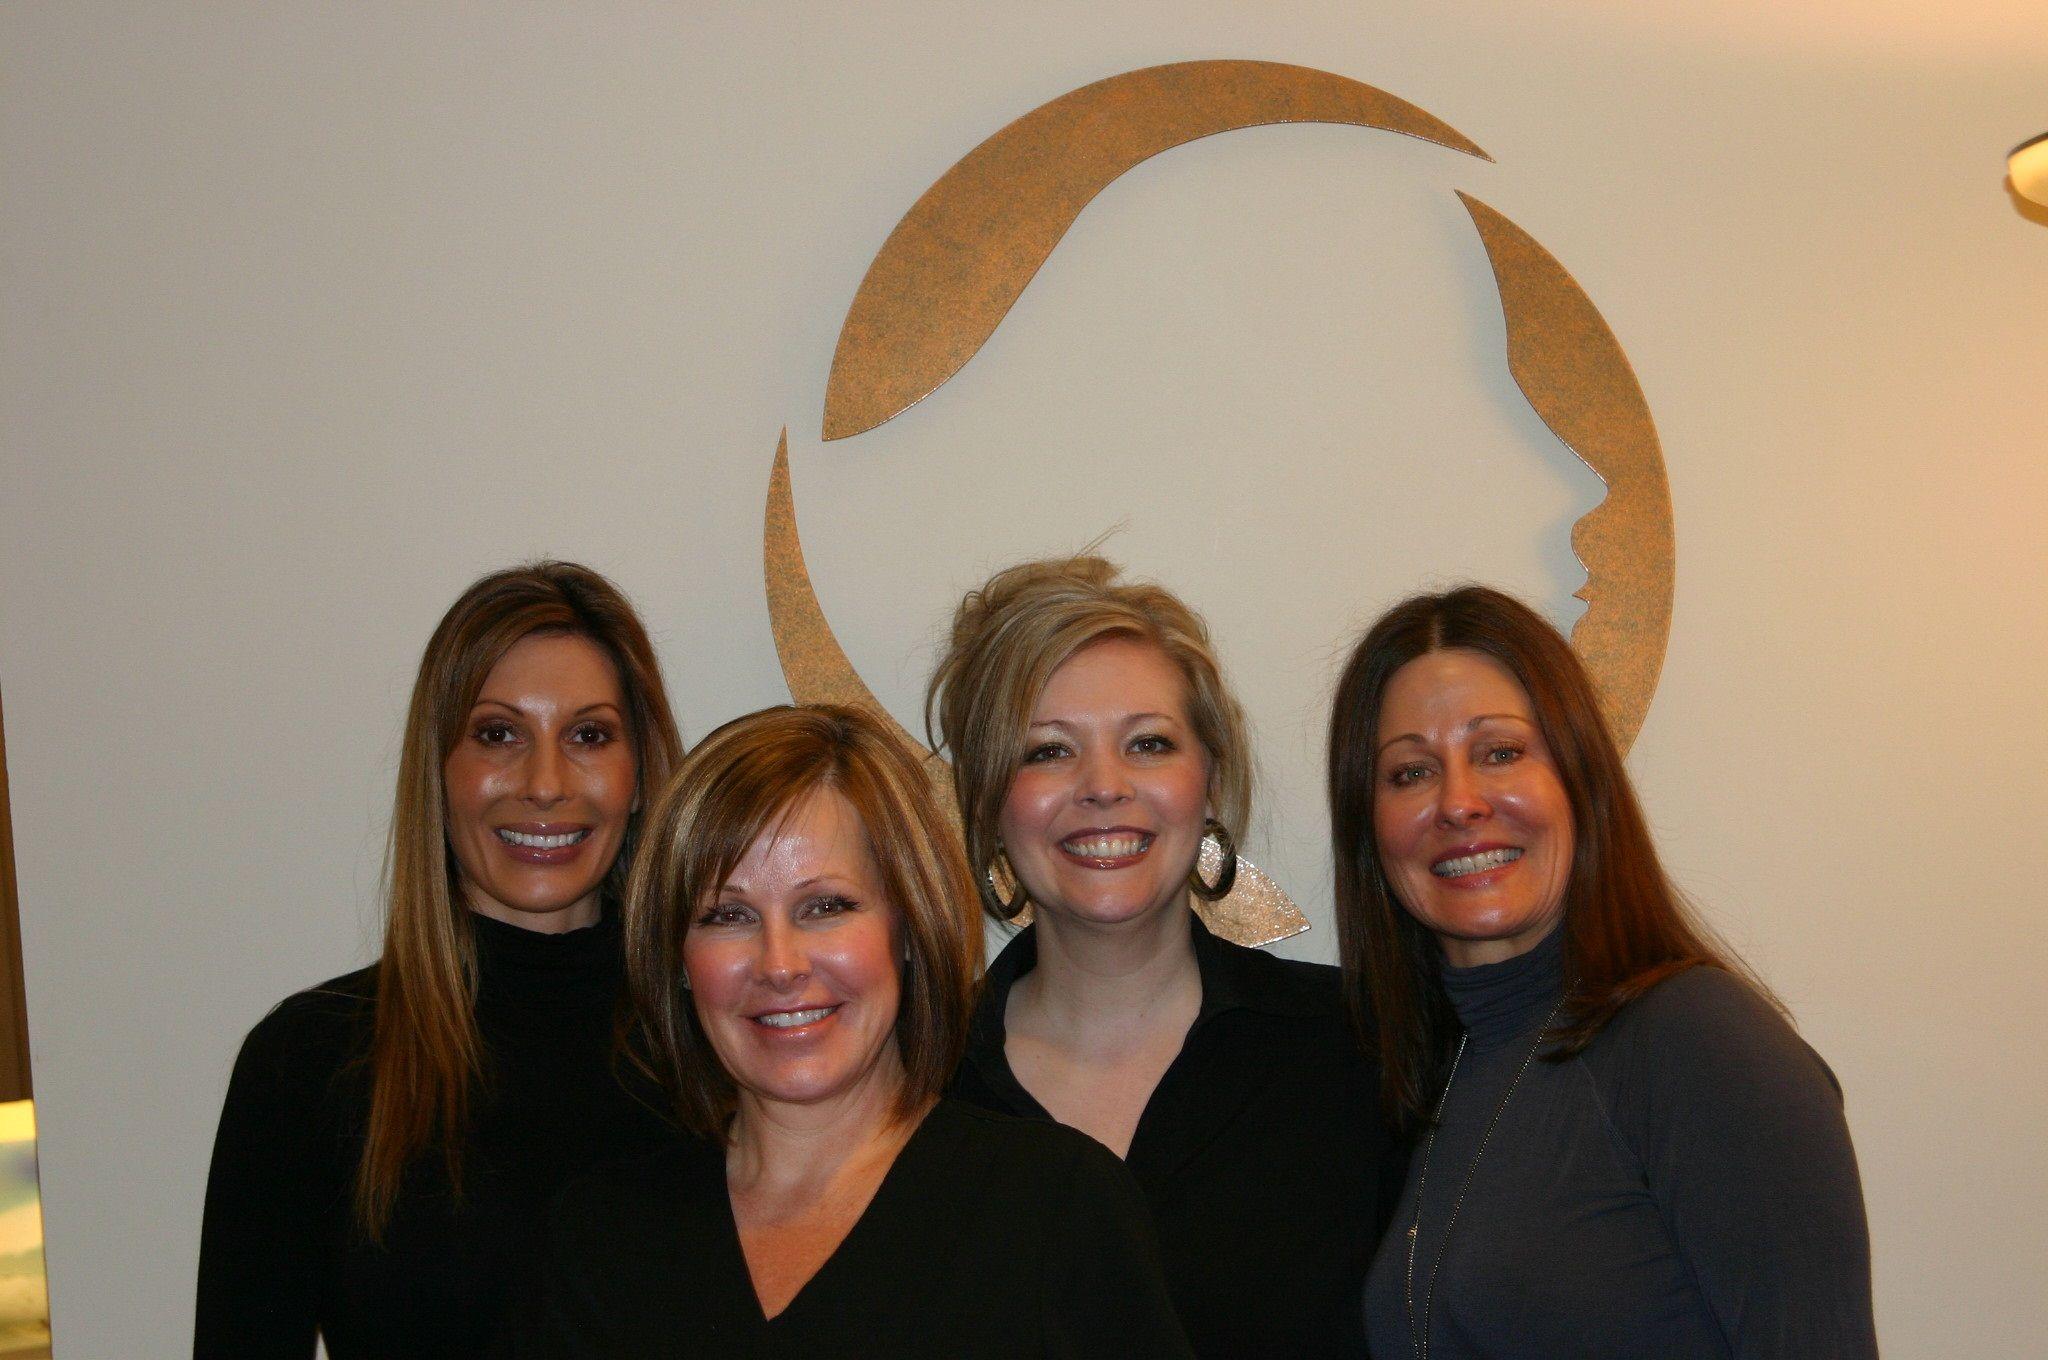 Our Estheticians at Oswego Spa & Laser at Dr. Lee Robinson's office #estheticians #spa #laser #cosmetic #plastic #surgery #rhinoplasty #facelift #facial #beauty #surgeons #lake #oswego #portland #oregon #tricities #washington @DrLeeRobinson